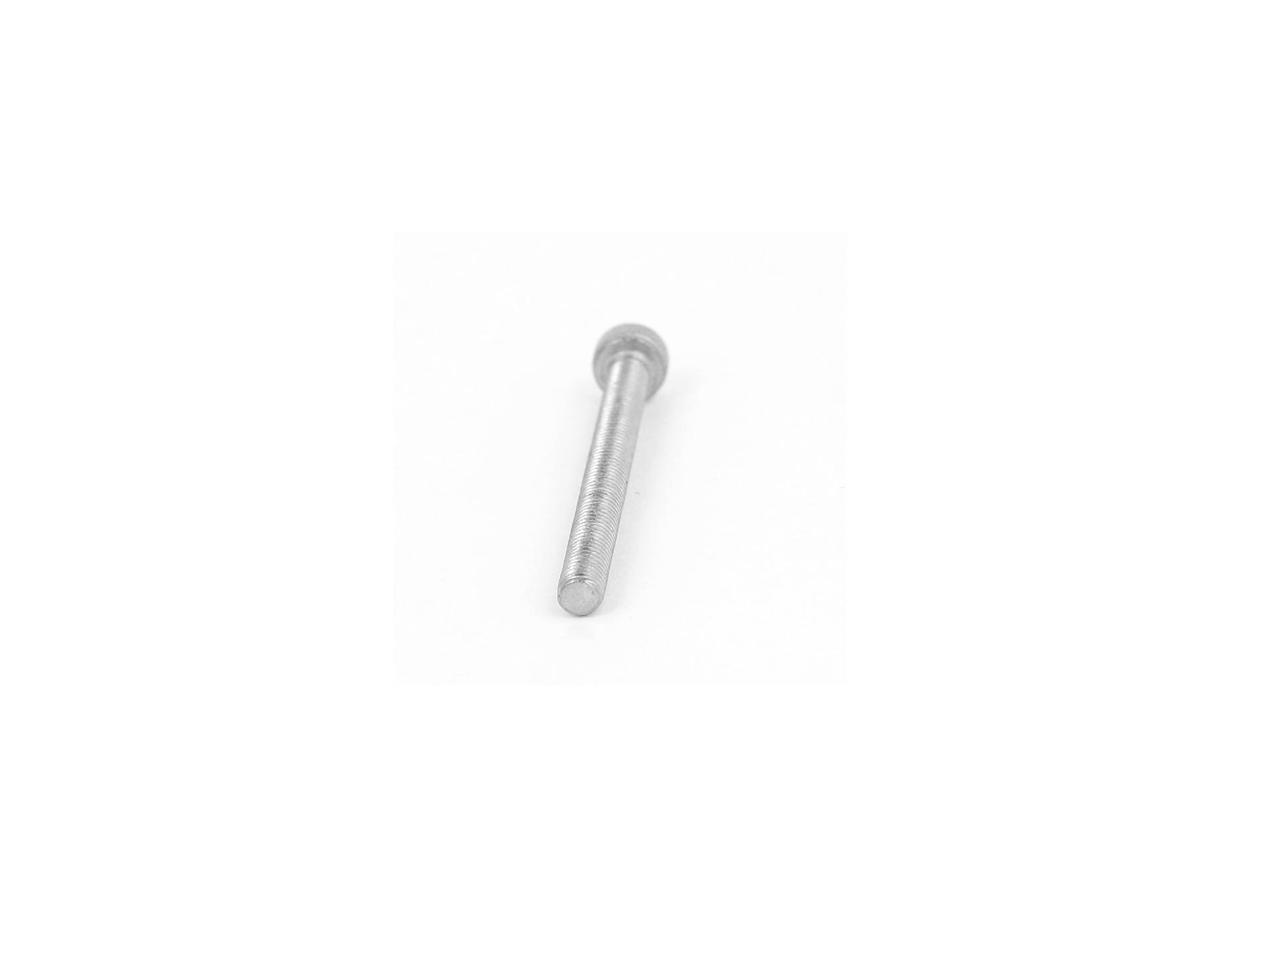 M2.5-0.45 X 4MM THRU 20MM   STAINLESS STEEL METRIC SOCKET HEAD C//S  ASSORTMENT